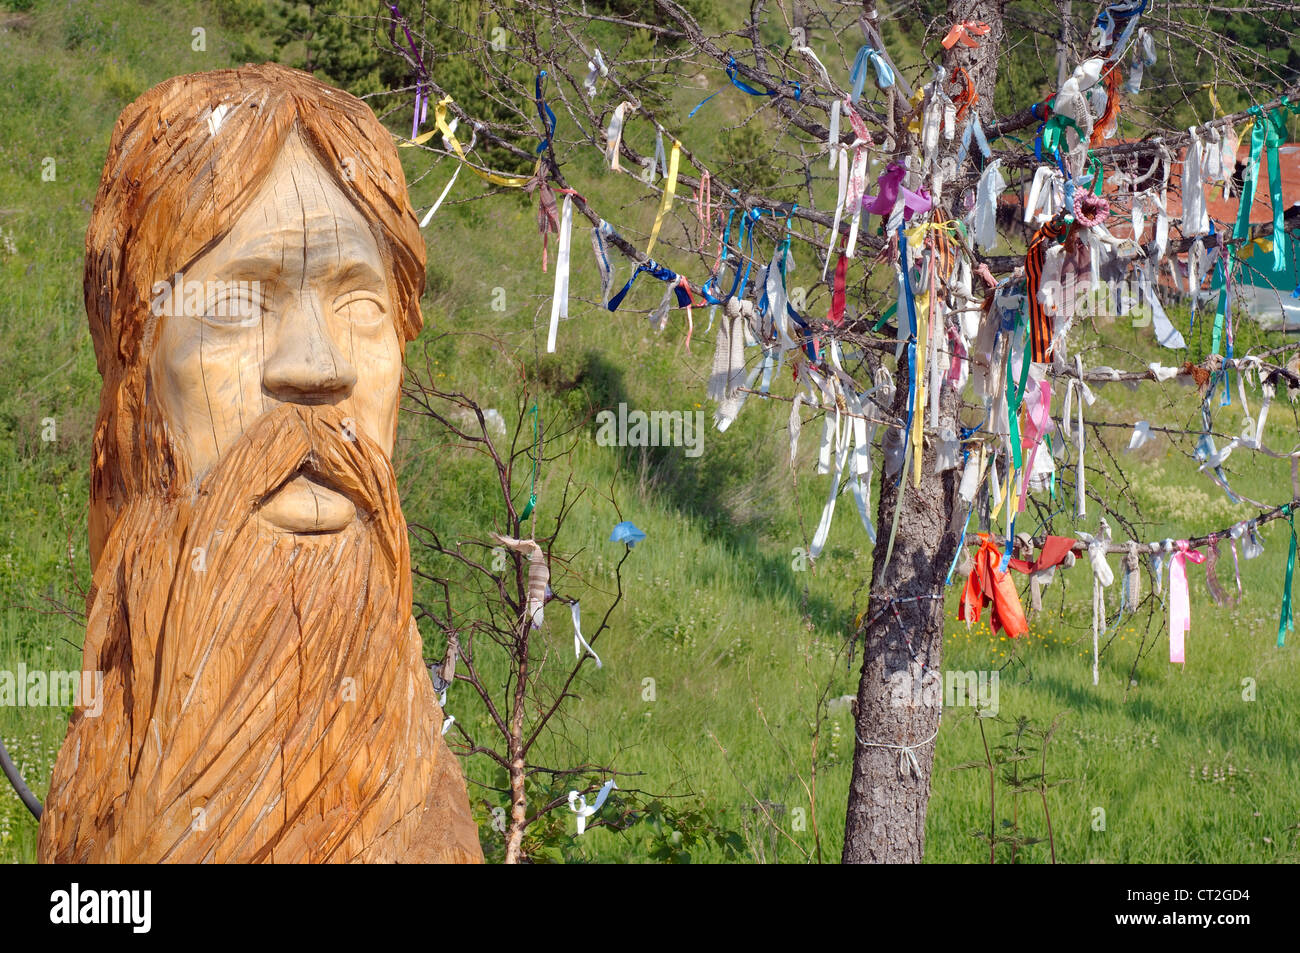 Idol & Tree of desires, settlement Listvyanka, Lake Baikal, Irkutsk region, Siberia, Russian Federation - Stock Image